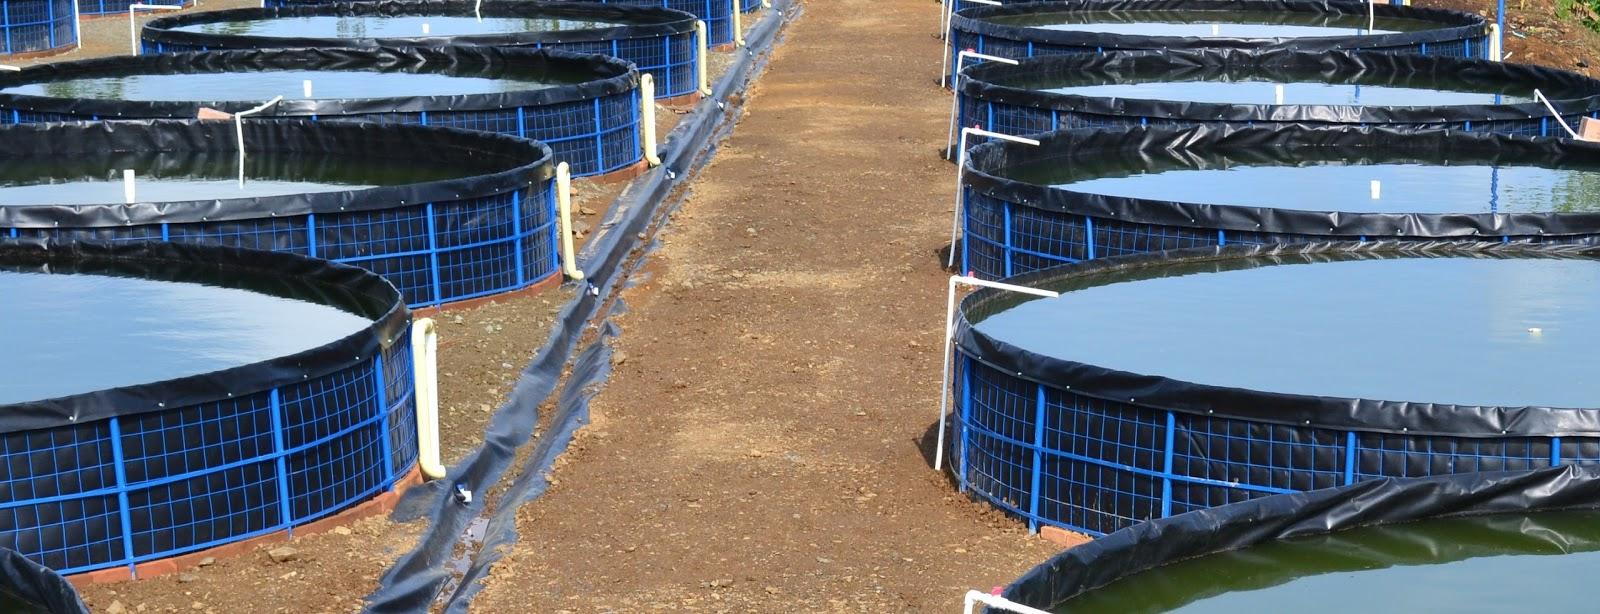 Asesoria y estanques para cultivo de tilapia mojarra roja Estanques para piscicultura